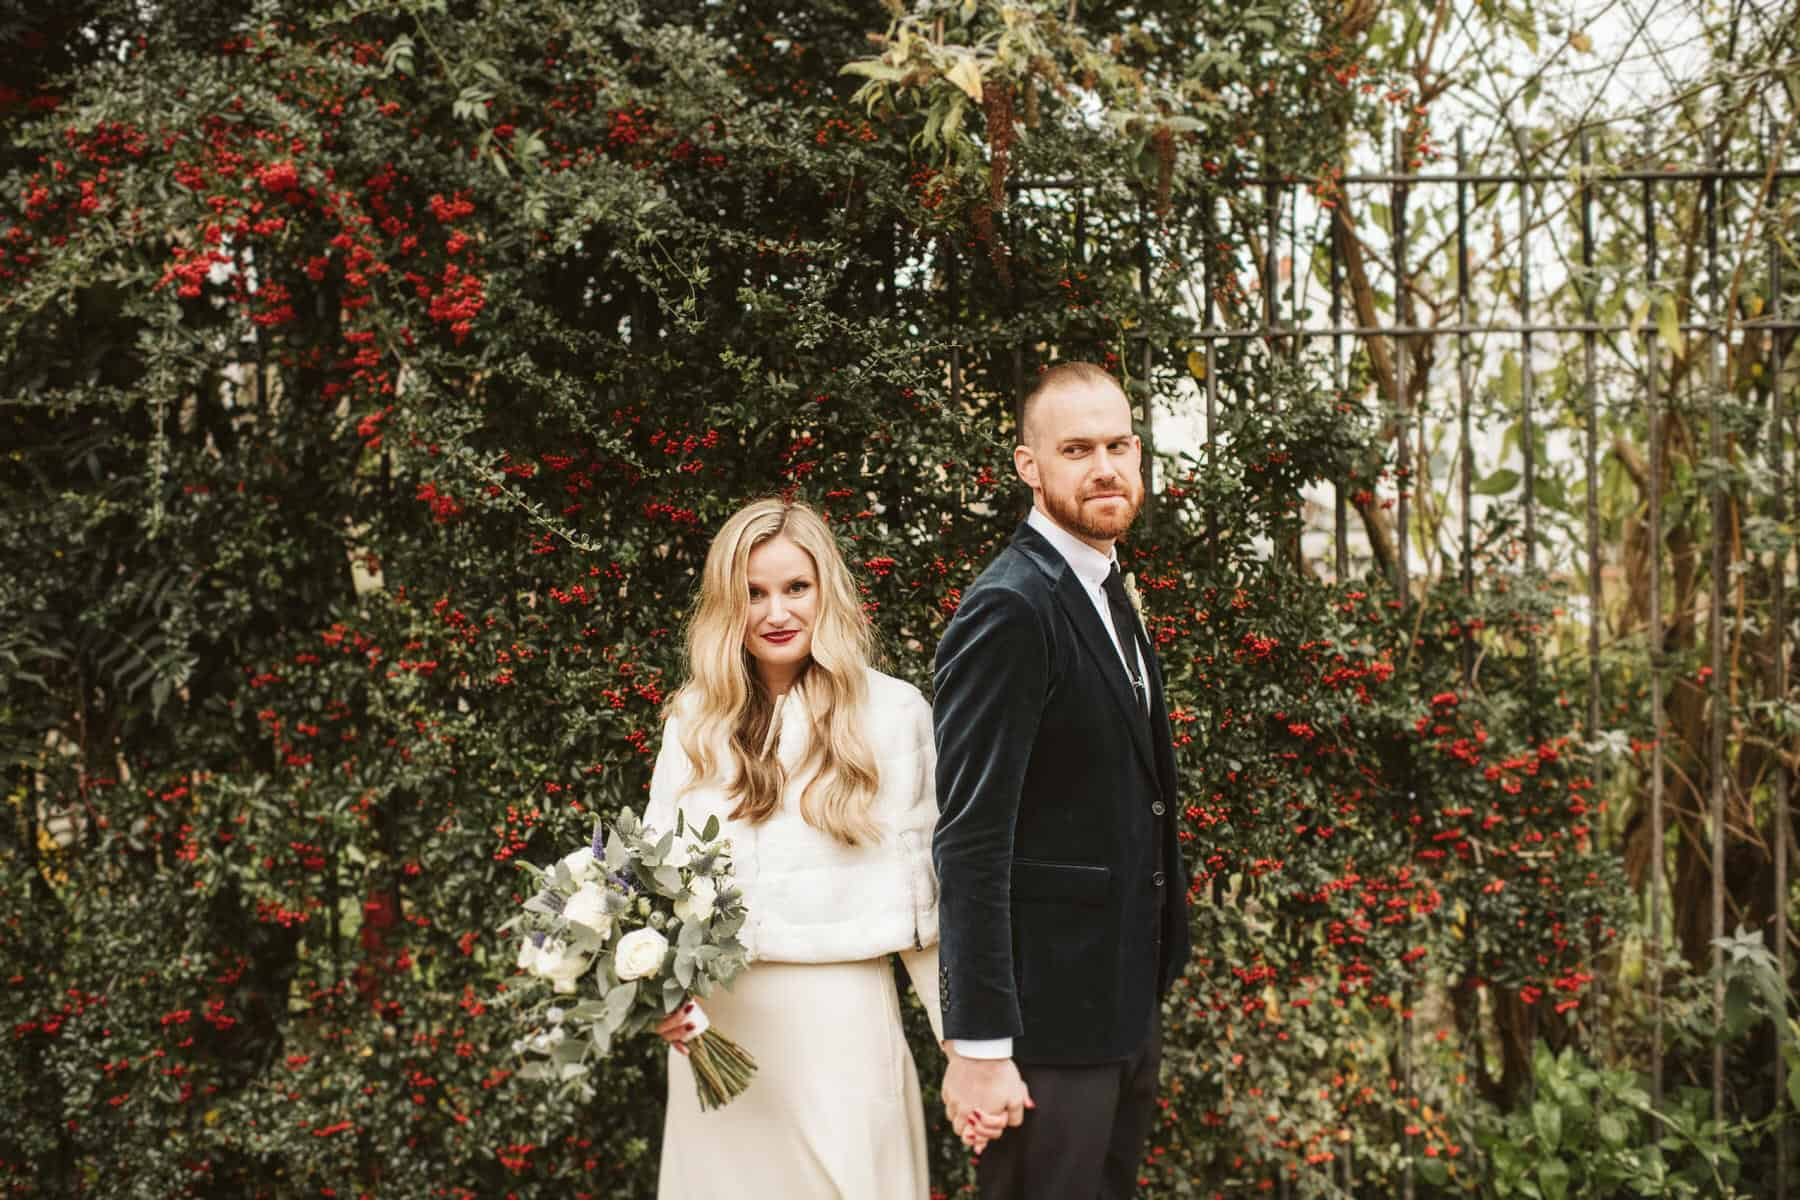 Newington Green wedding photography